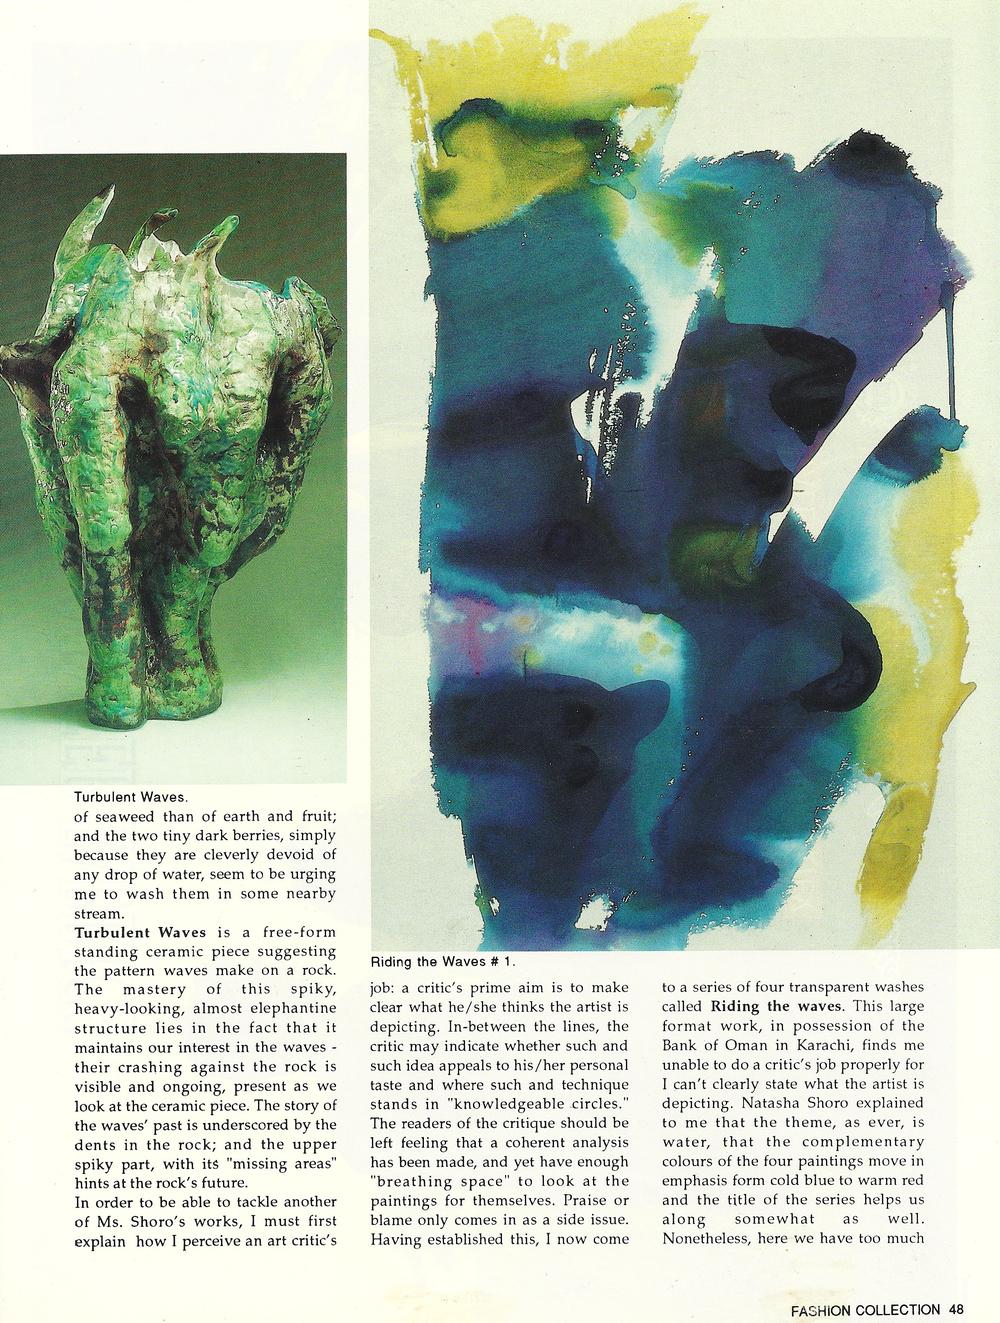 annual fashio collection_1992_pg48.jpg